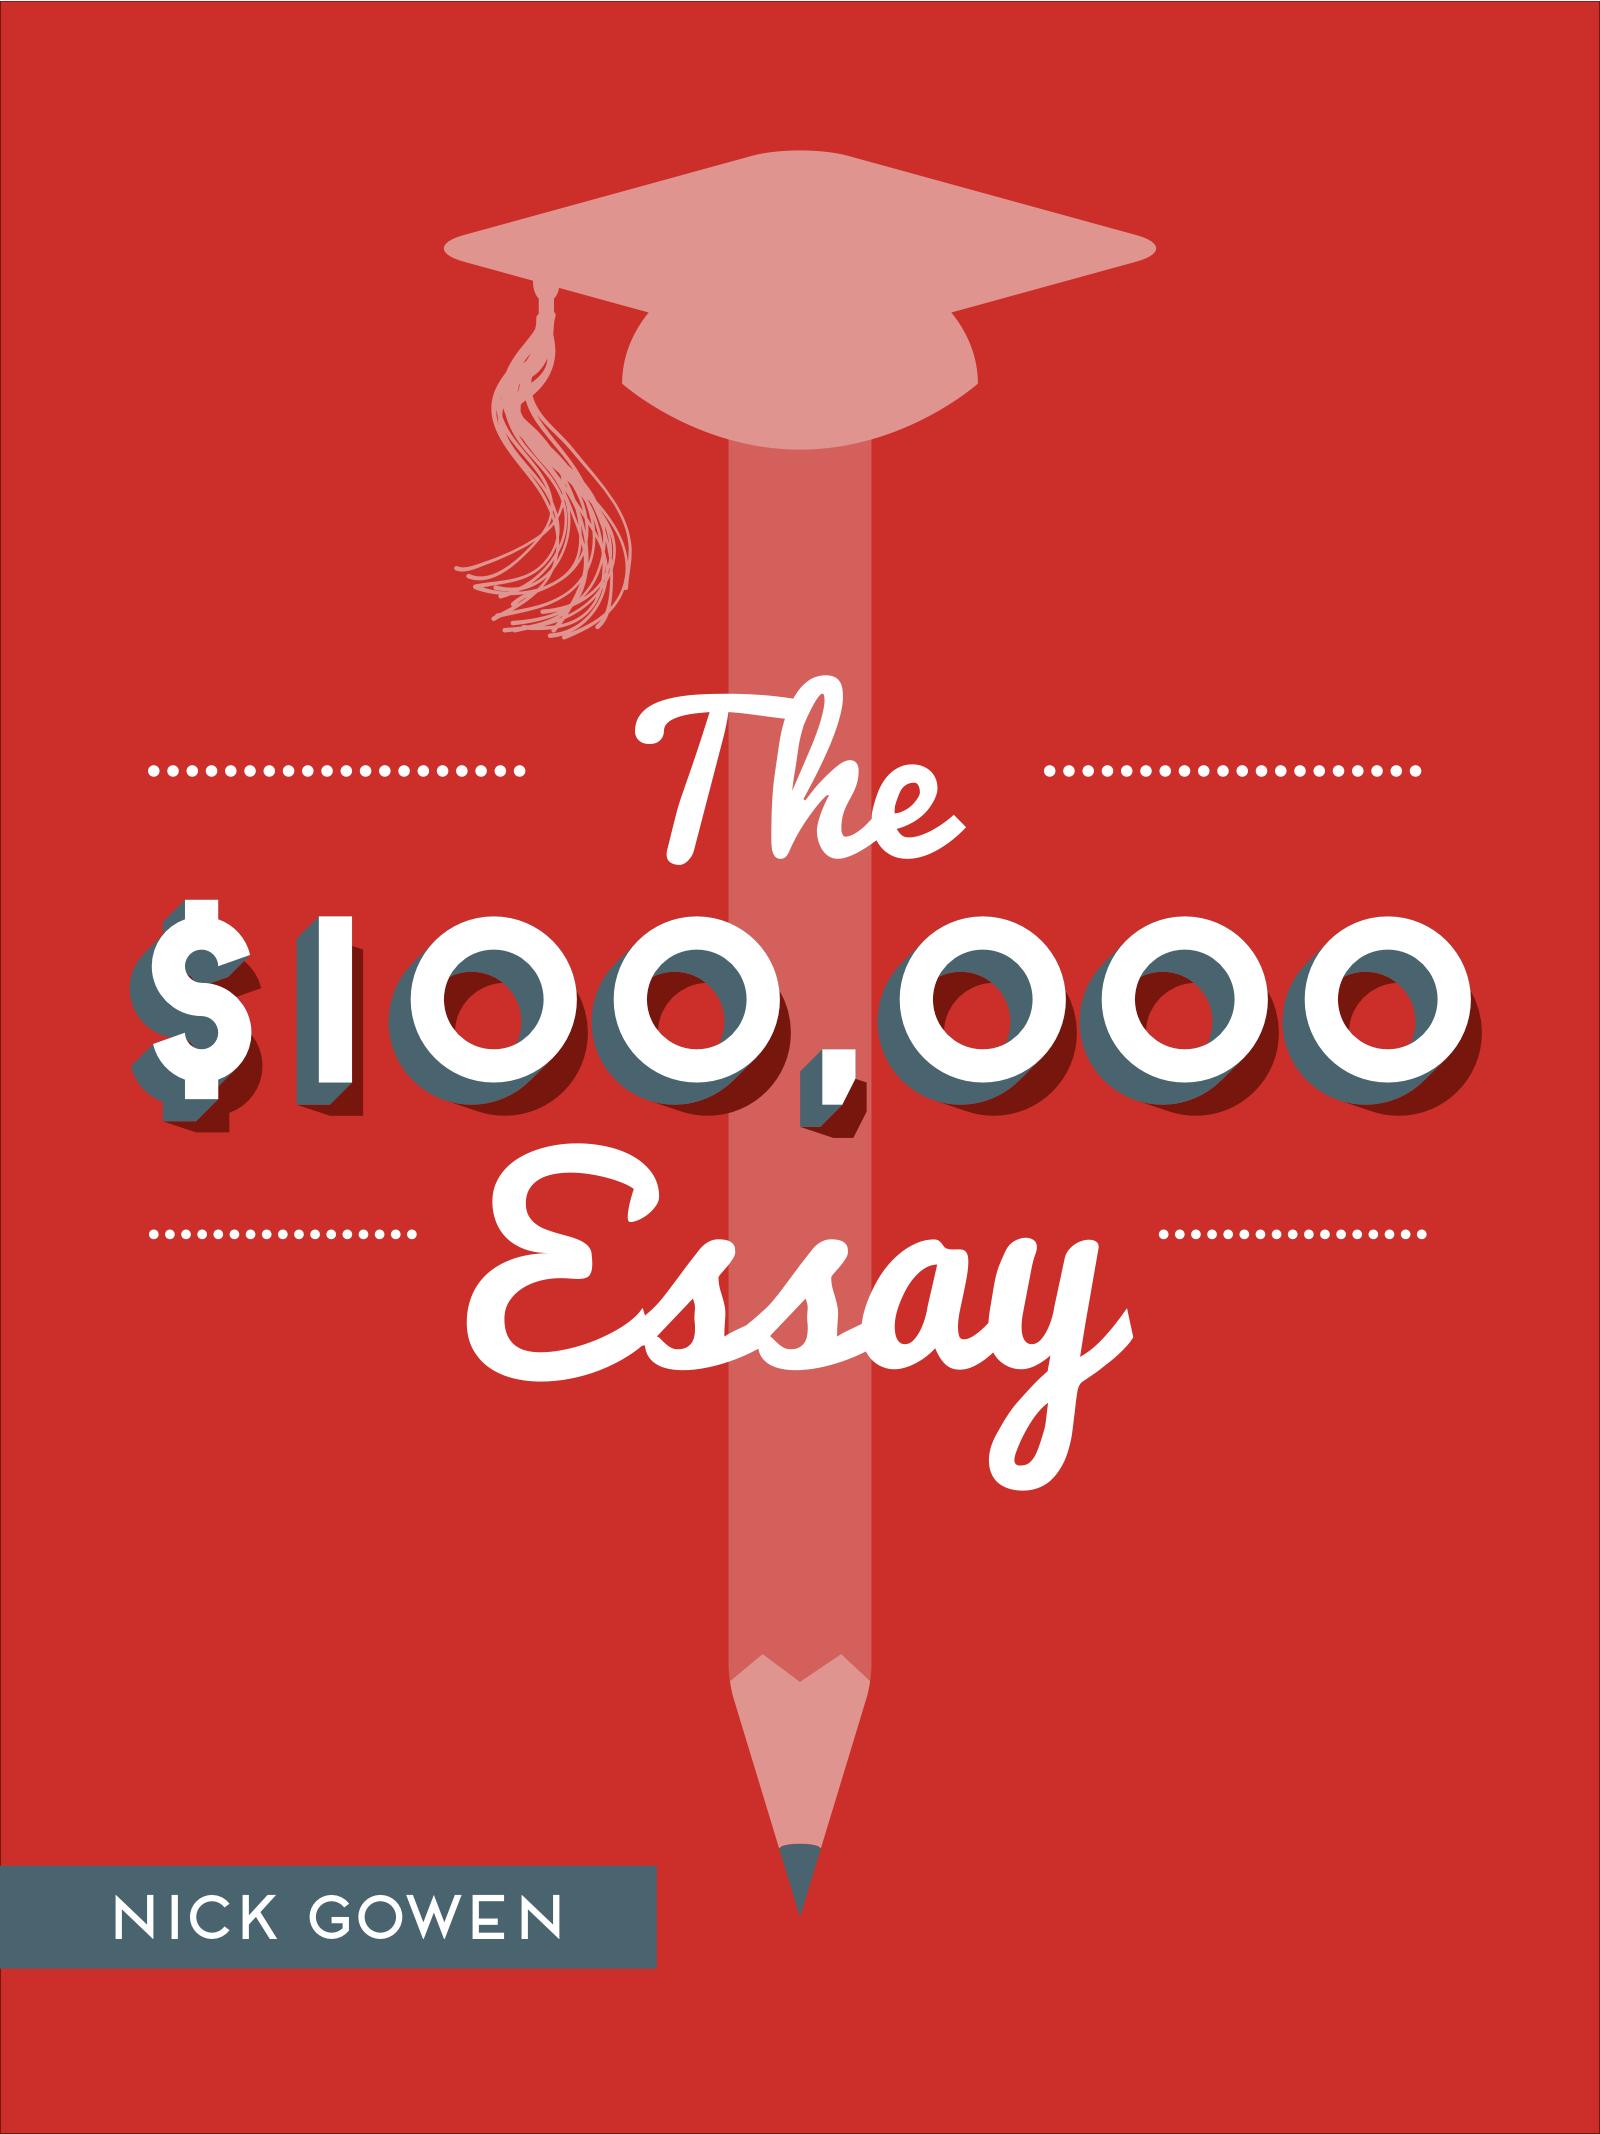 My college admission essay coaching  WHAT MAKES ESSAY COACHING UNIQUE